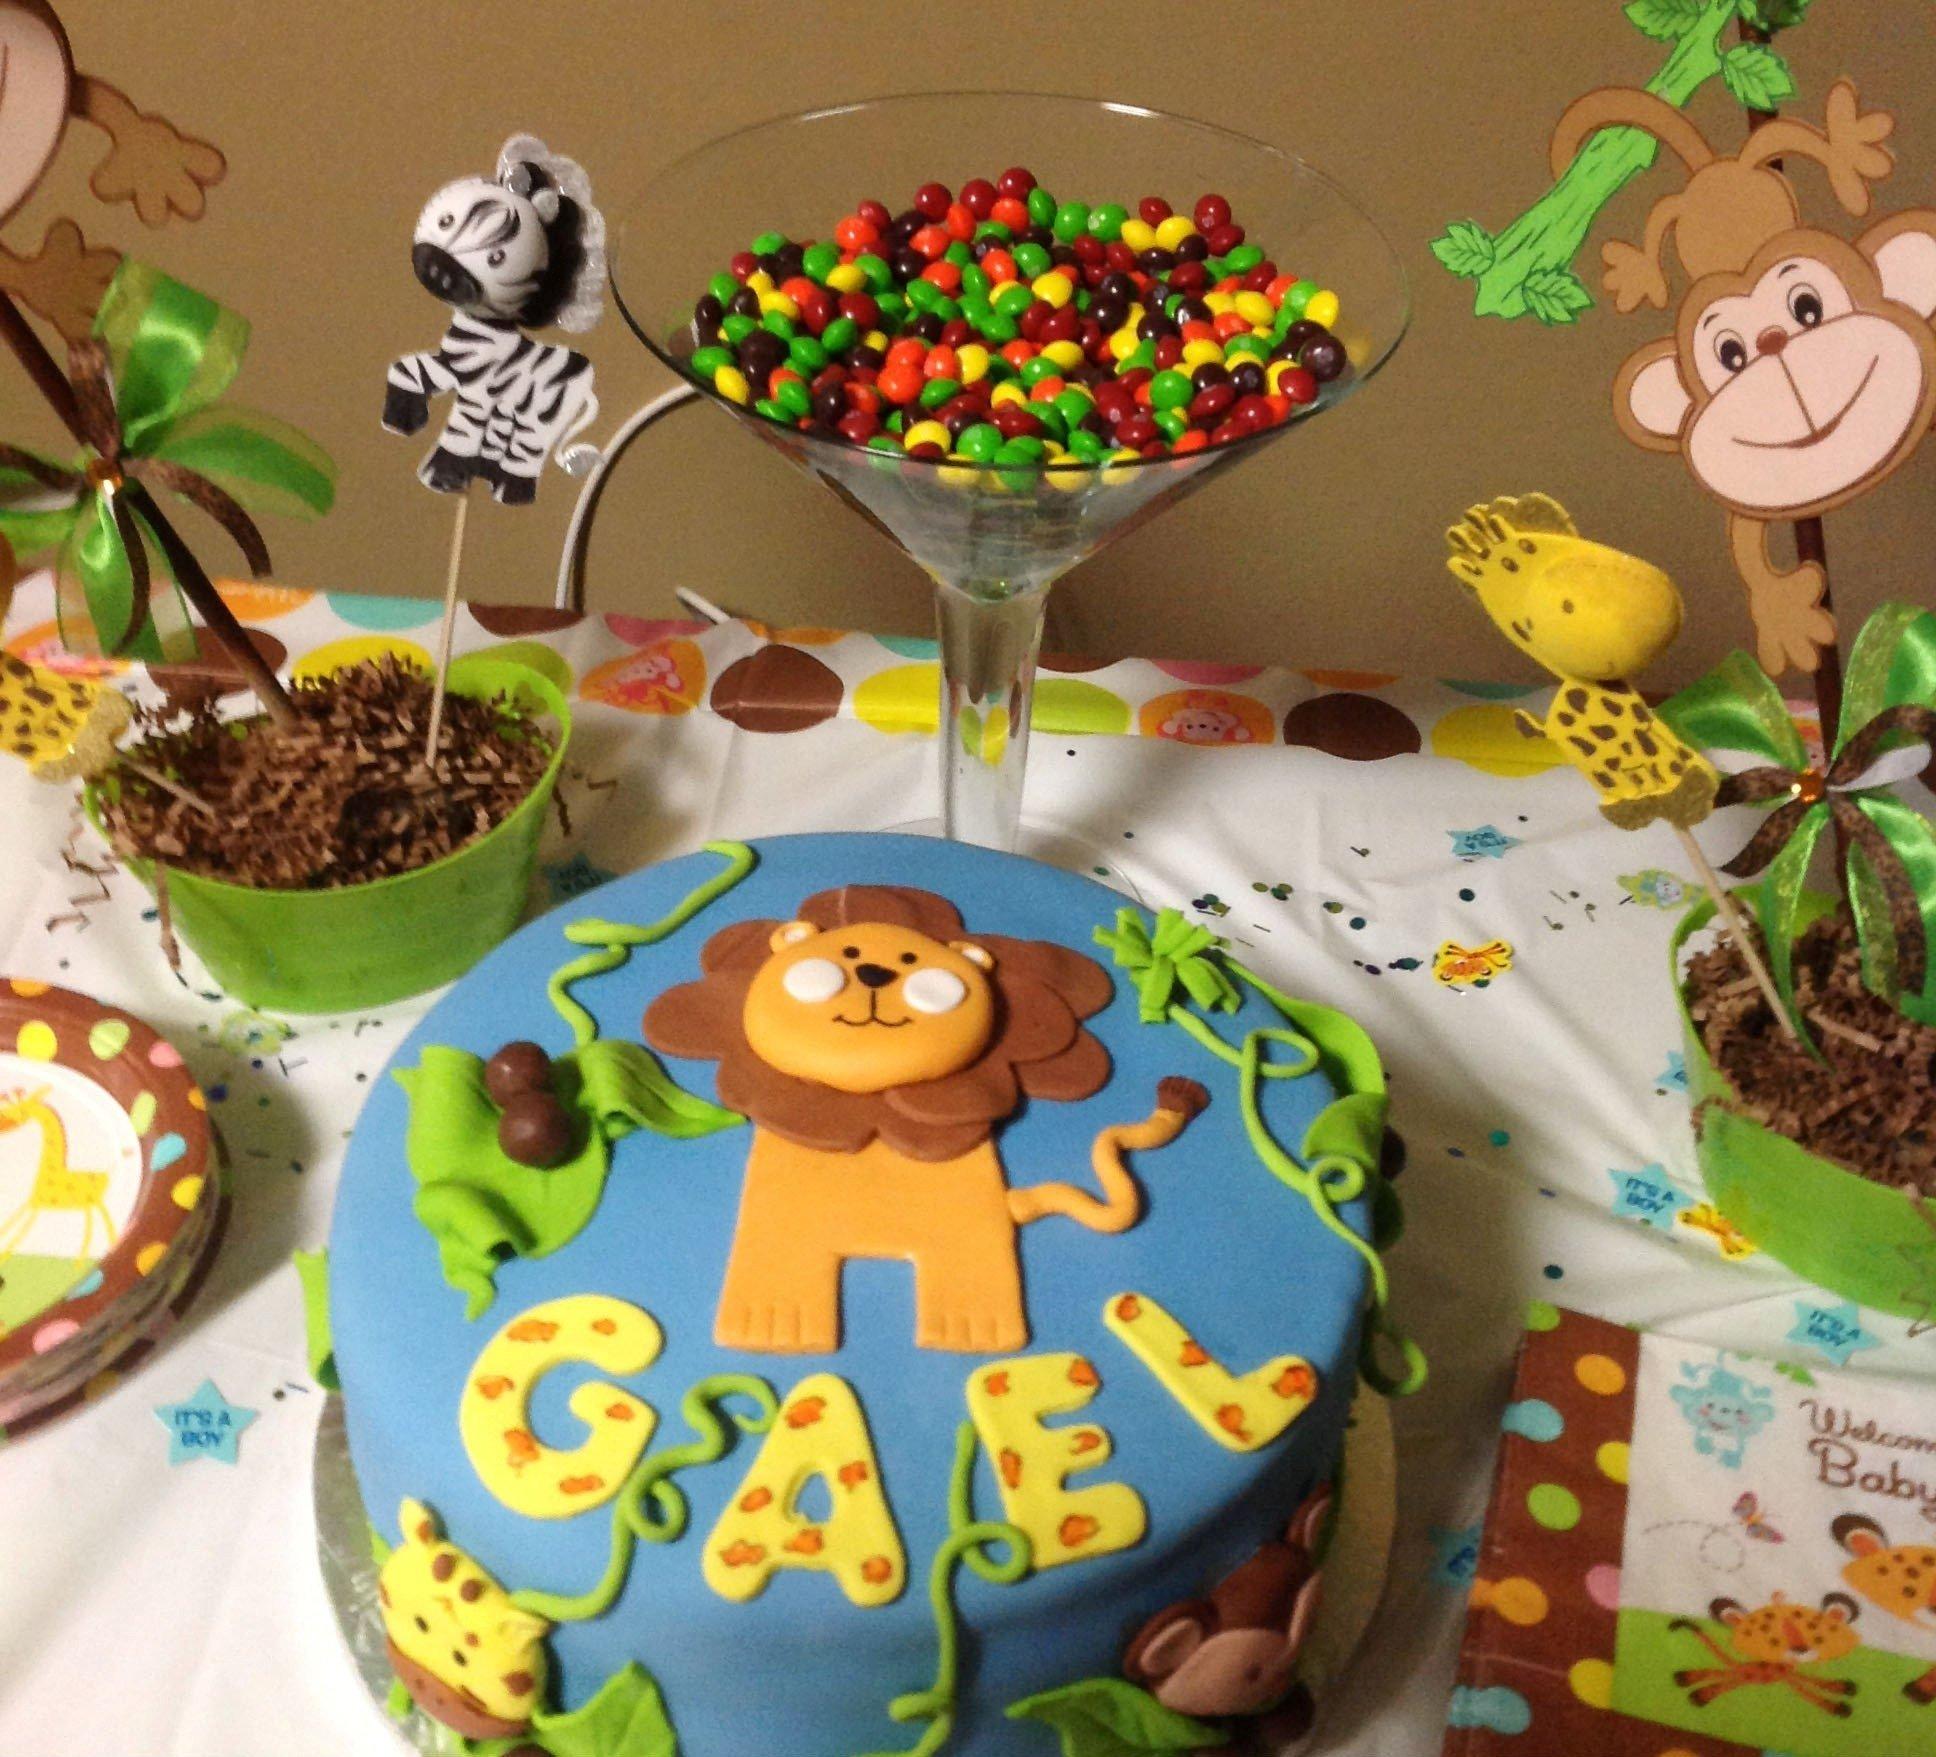 10 Famous Baby Shower Safari Theme Ideas